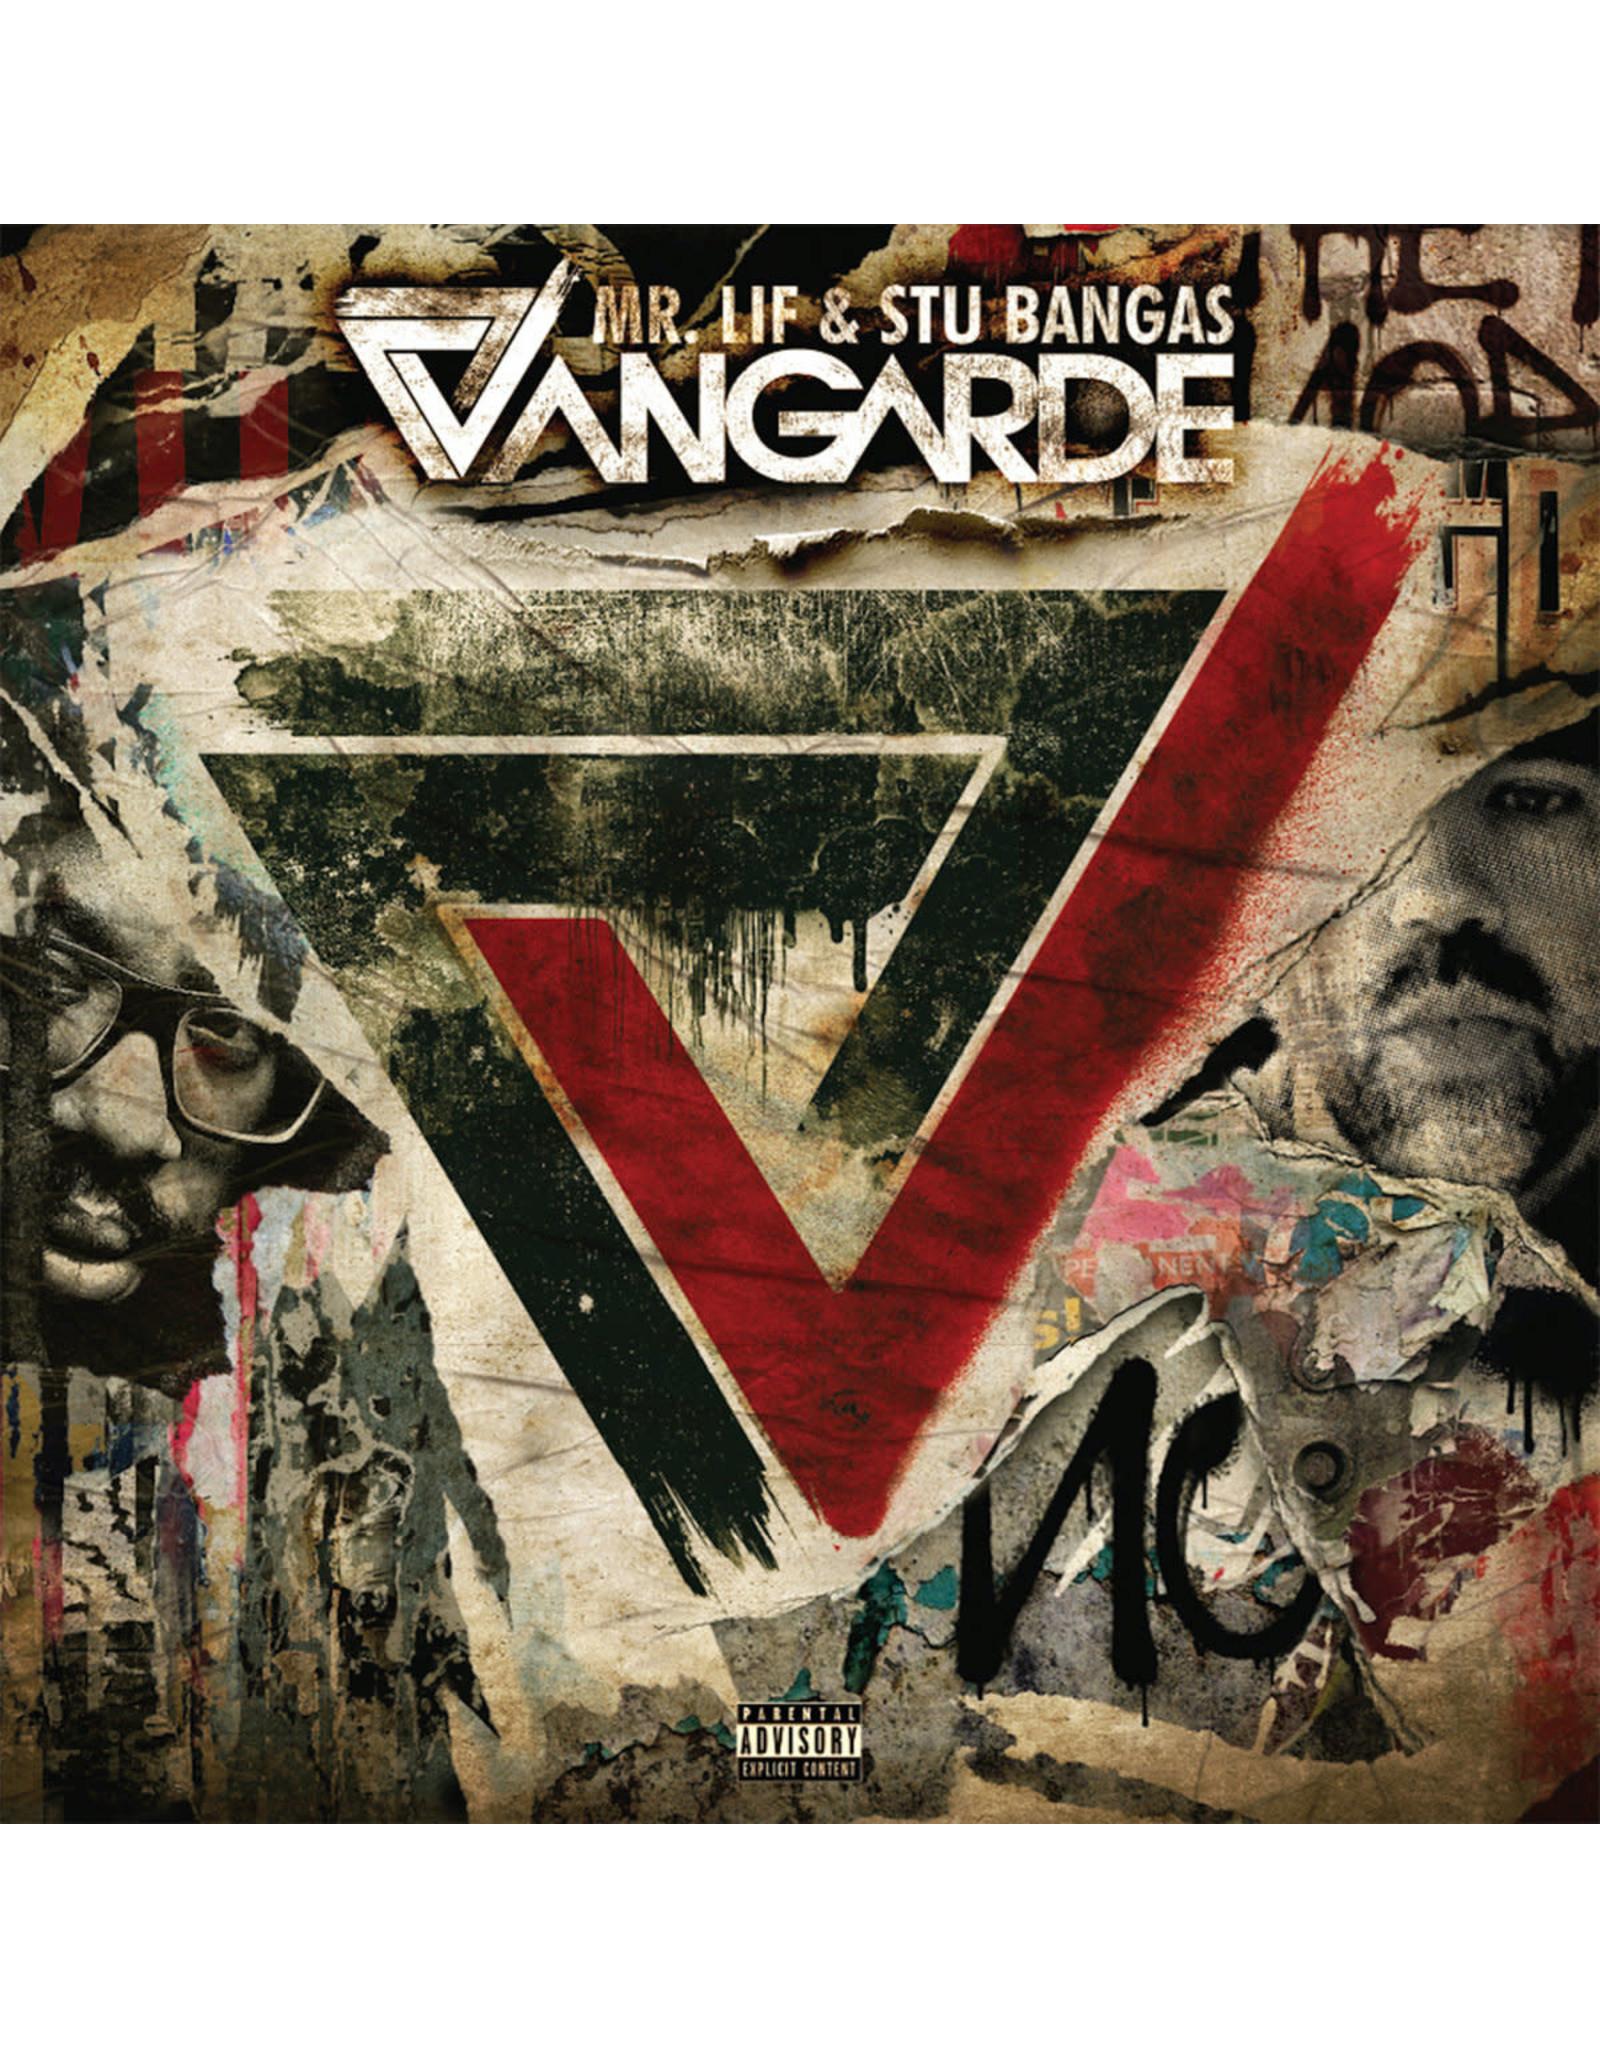 New Vinyl Mr. Lif & Stu Bangas - Vangarde LP